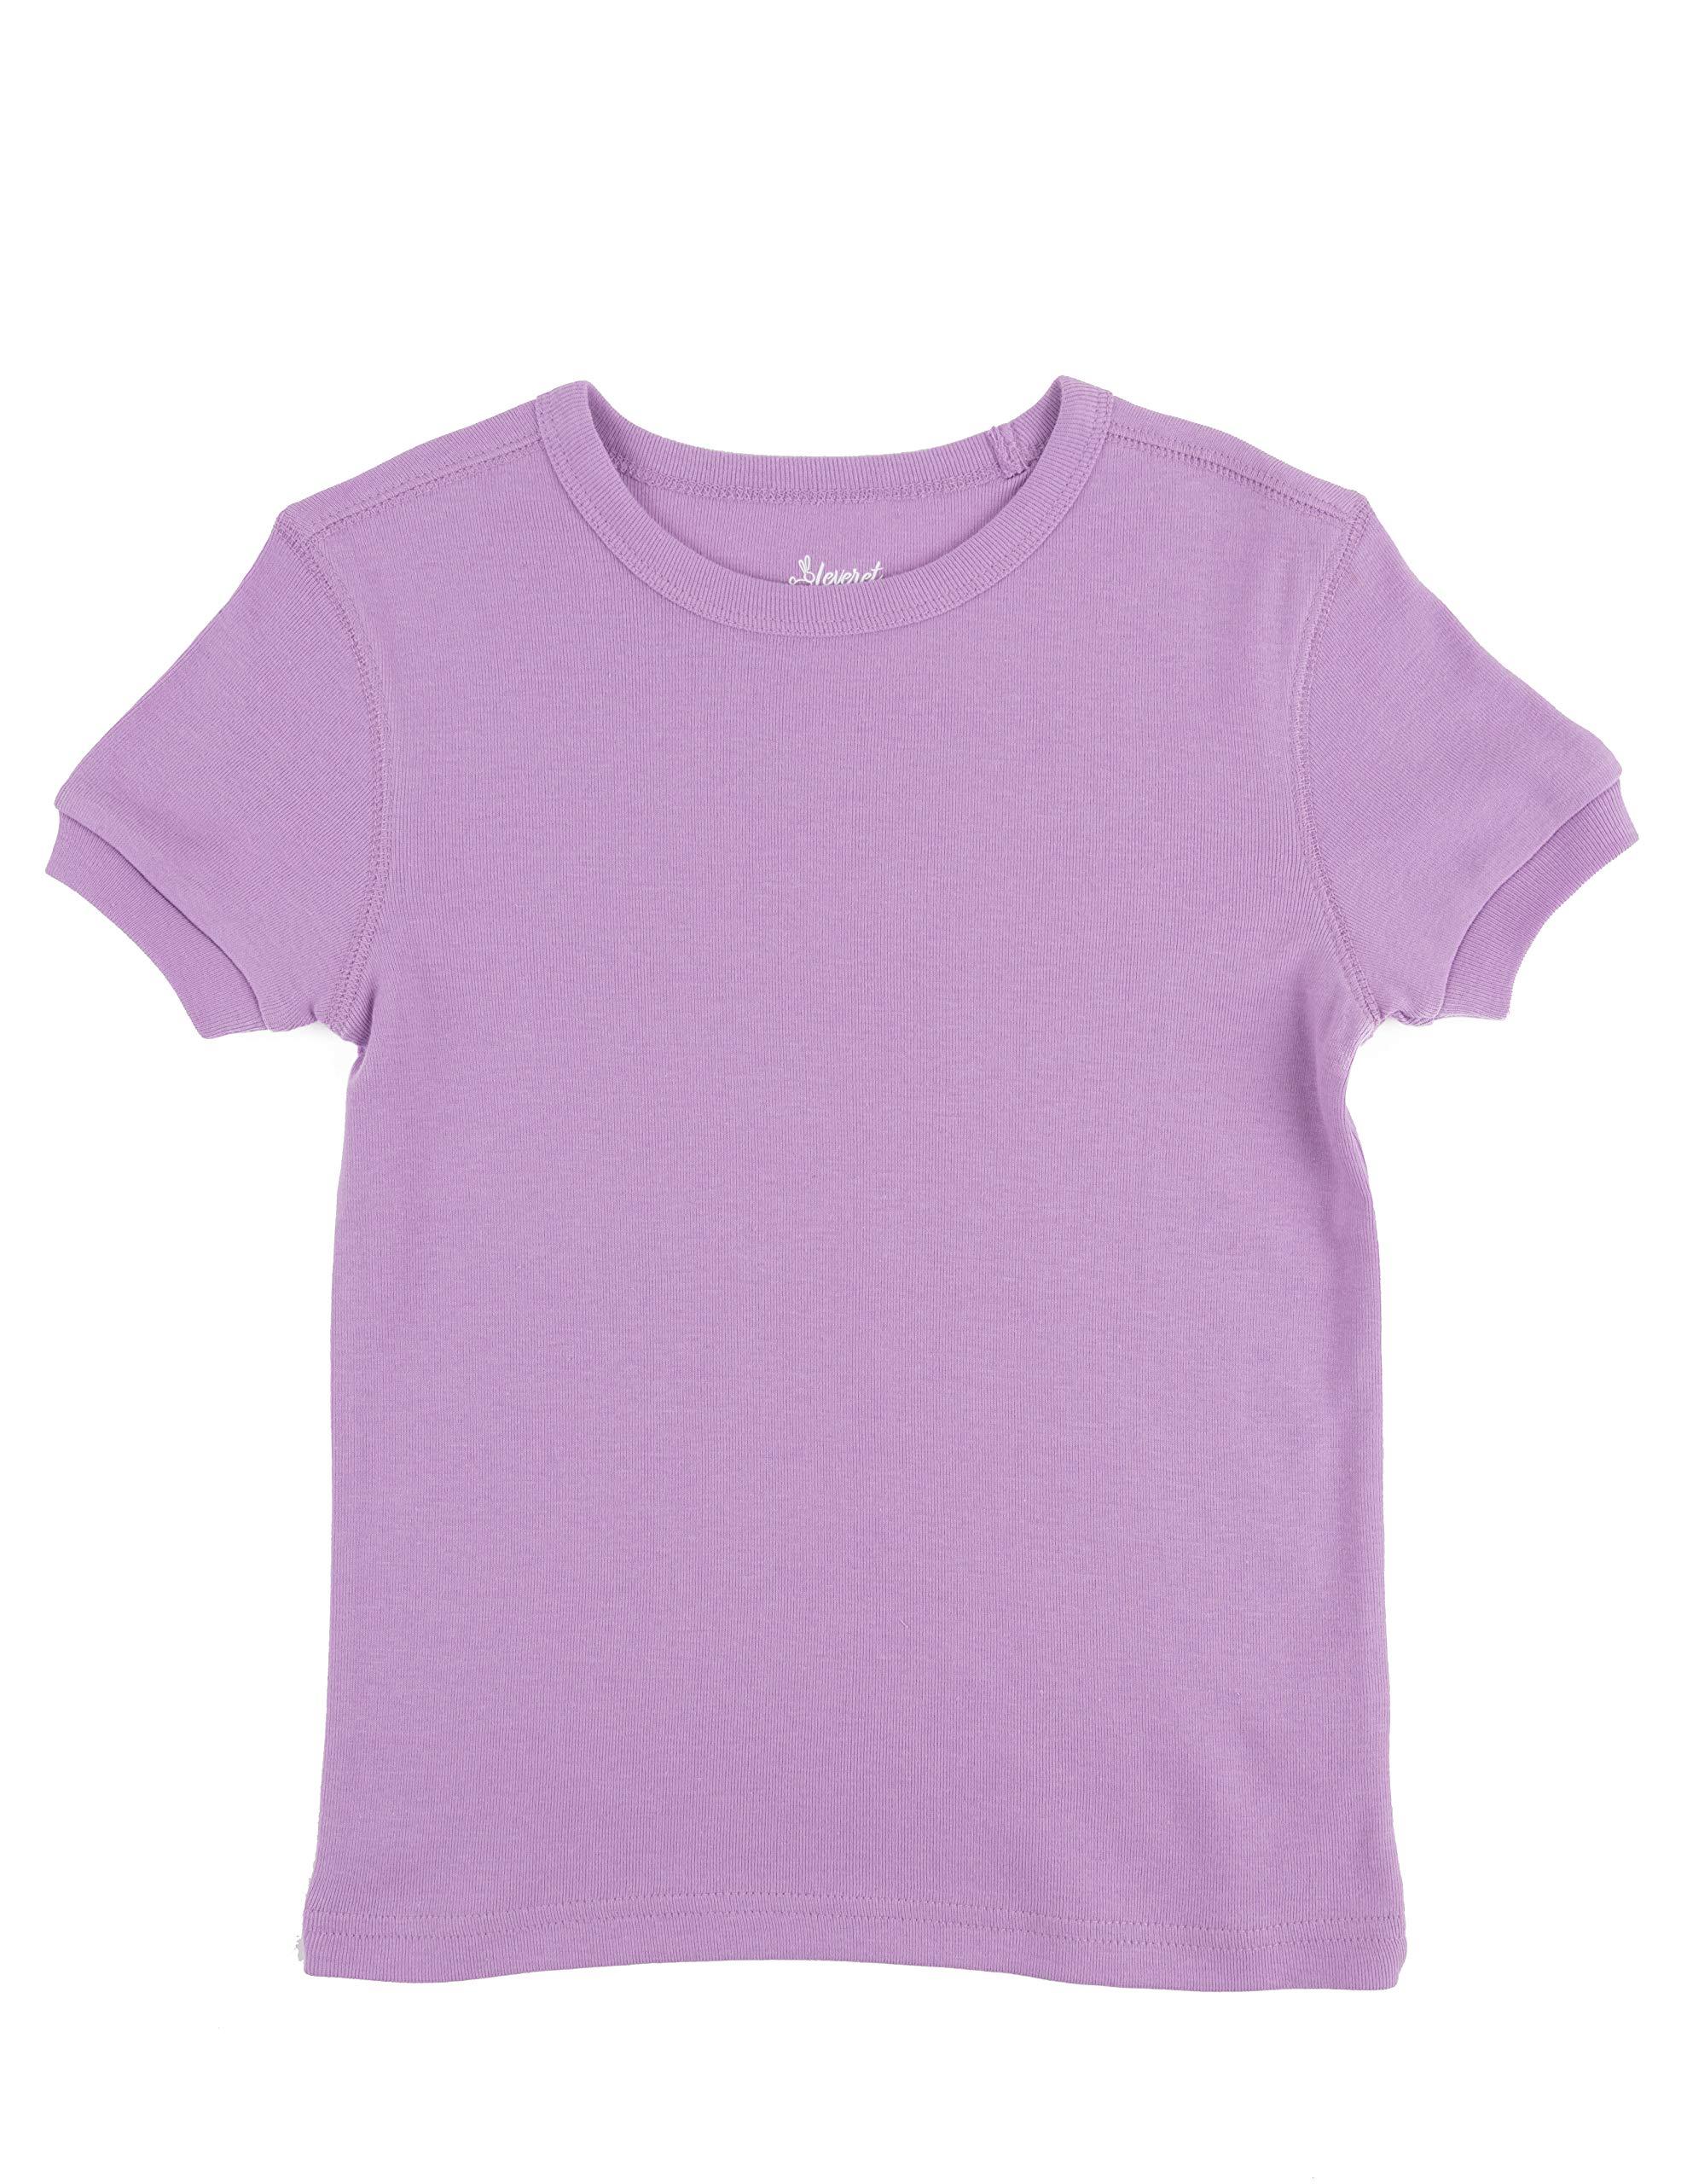 thumbnail 18 - Leveret-Short-Sleeve-Boys-Girls-Kids-amp-Toddler-T-Shirt-100-Cotton-2-14-Years